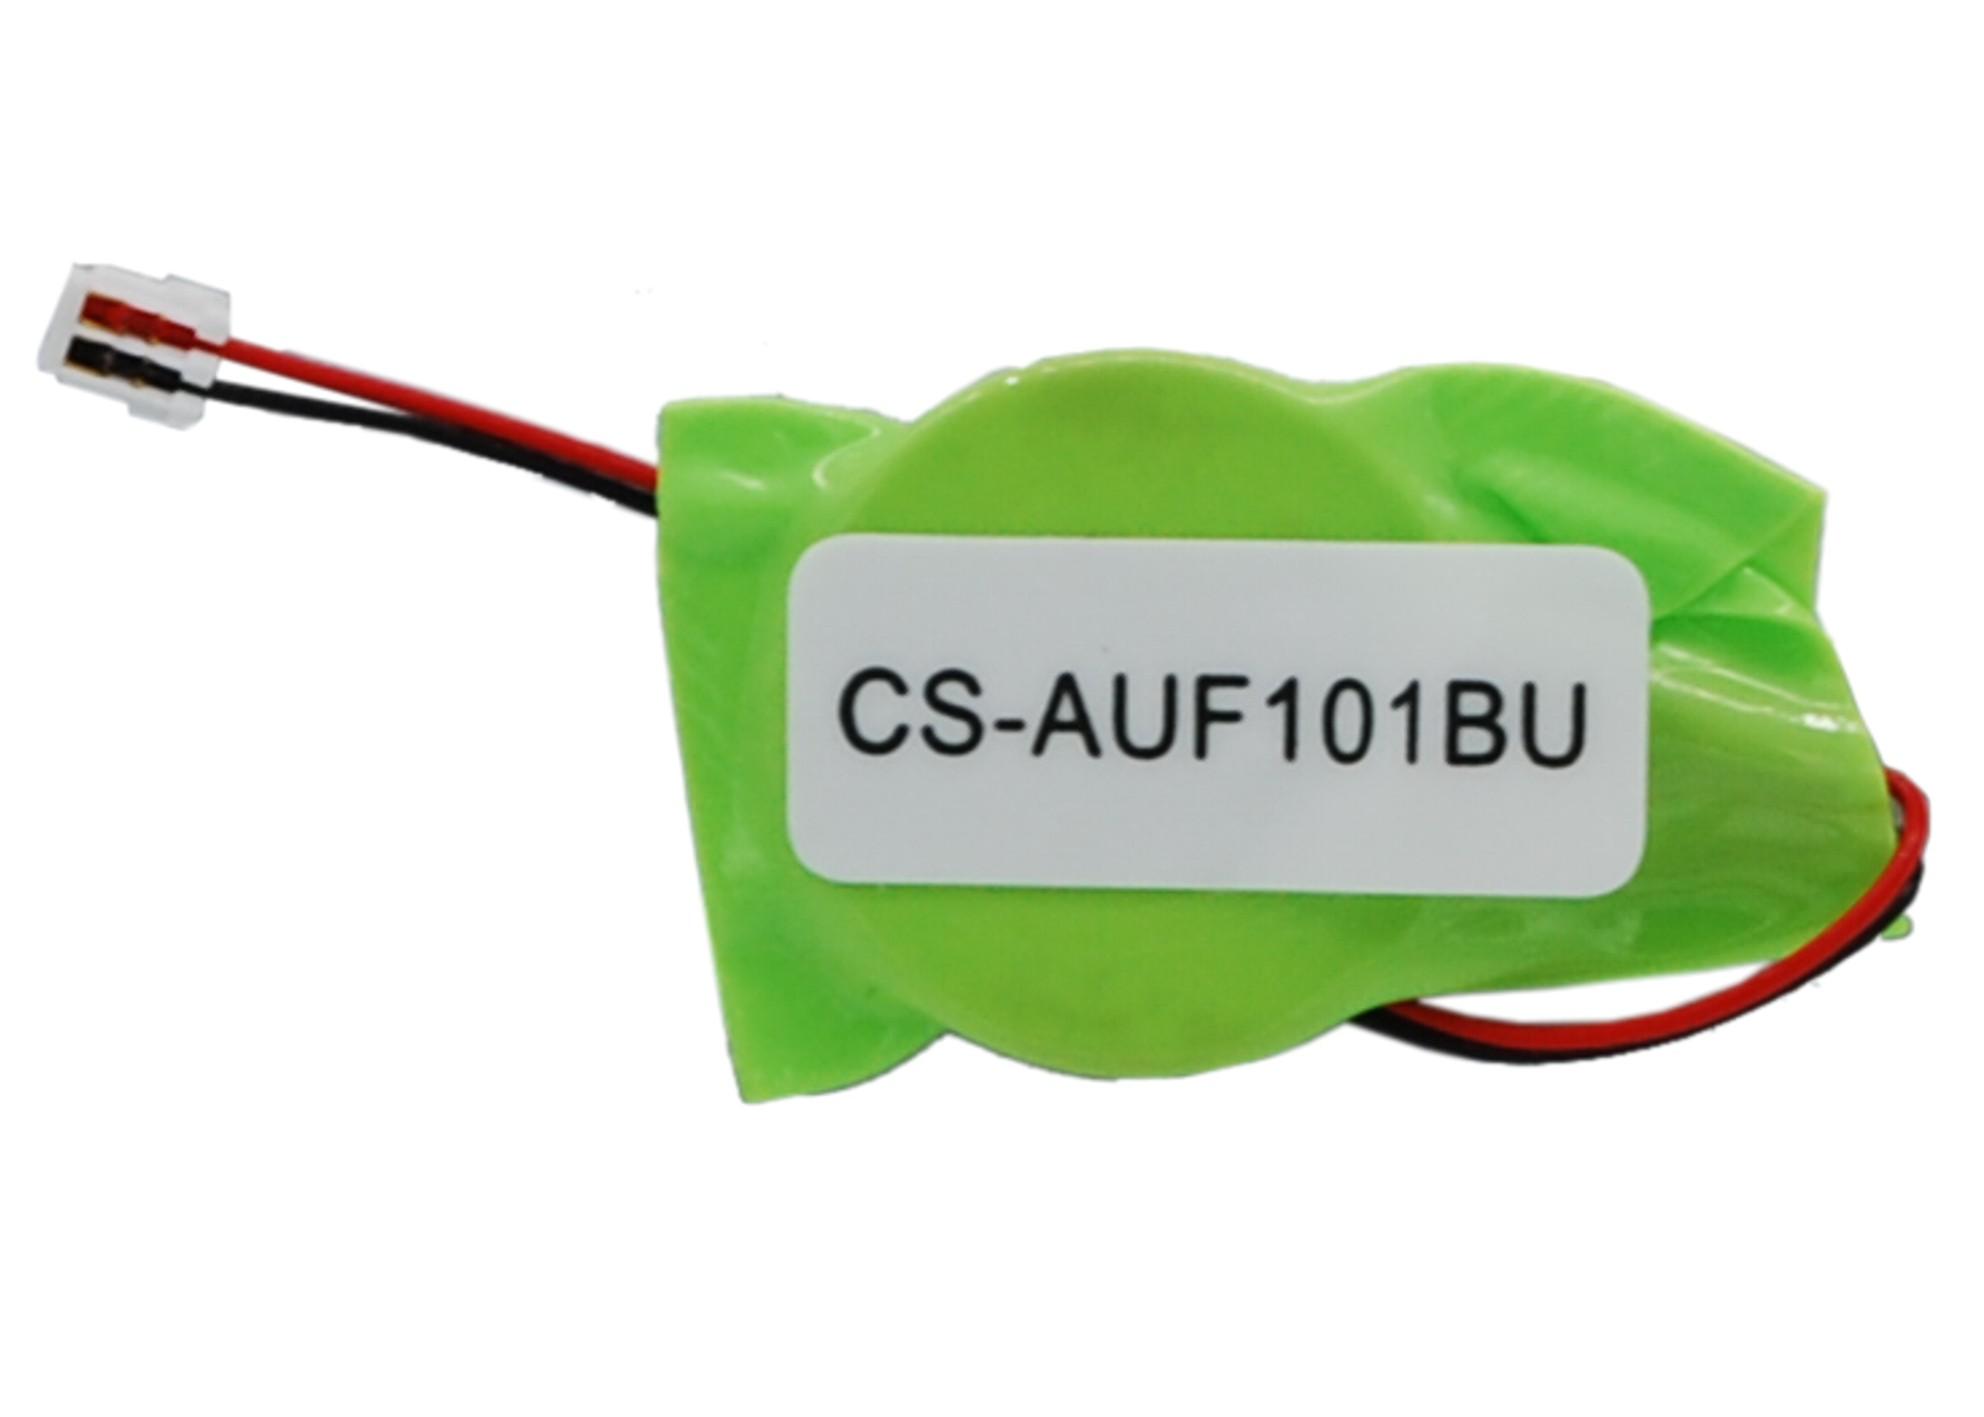 Cameron Sino baterie cmos pro ASUS Eee Pad Transformer TF101-1B031A 3V Li-ion 40mAh zelená - neoriginální